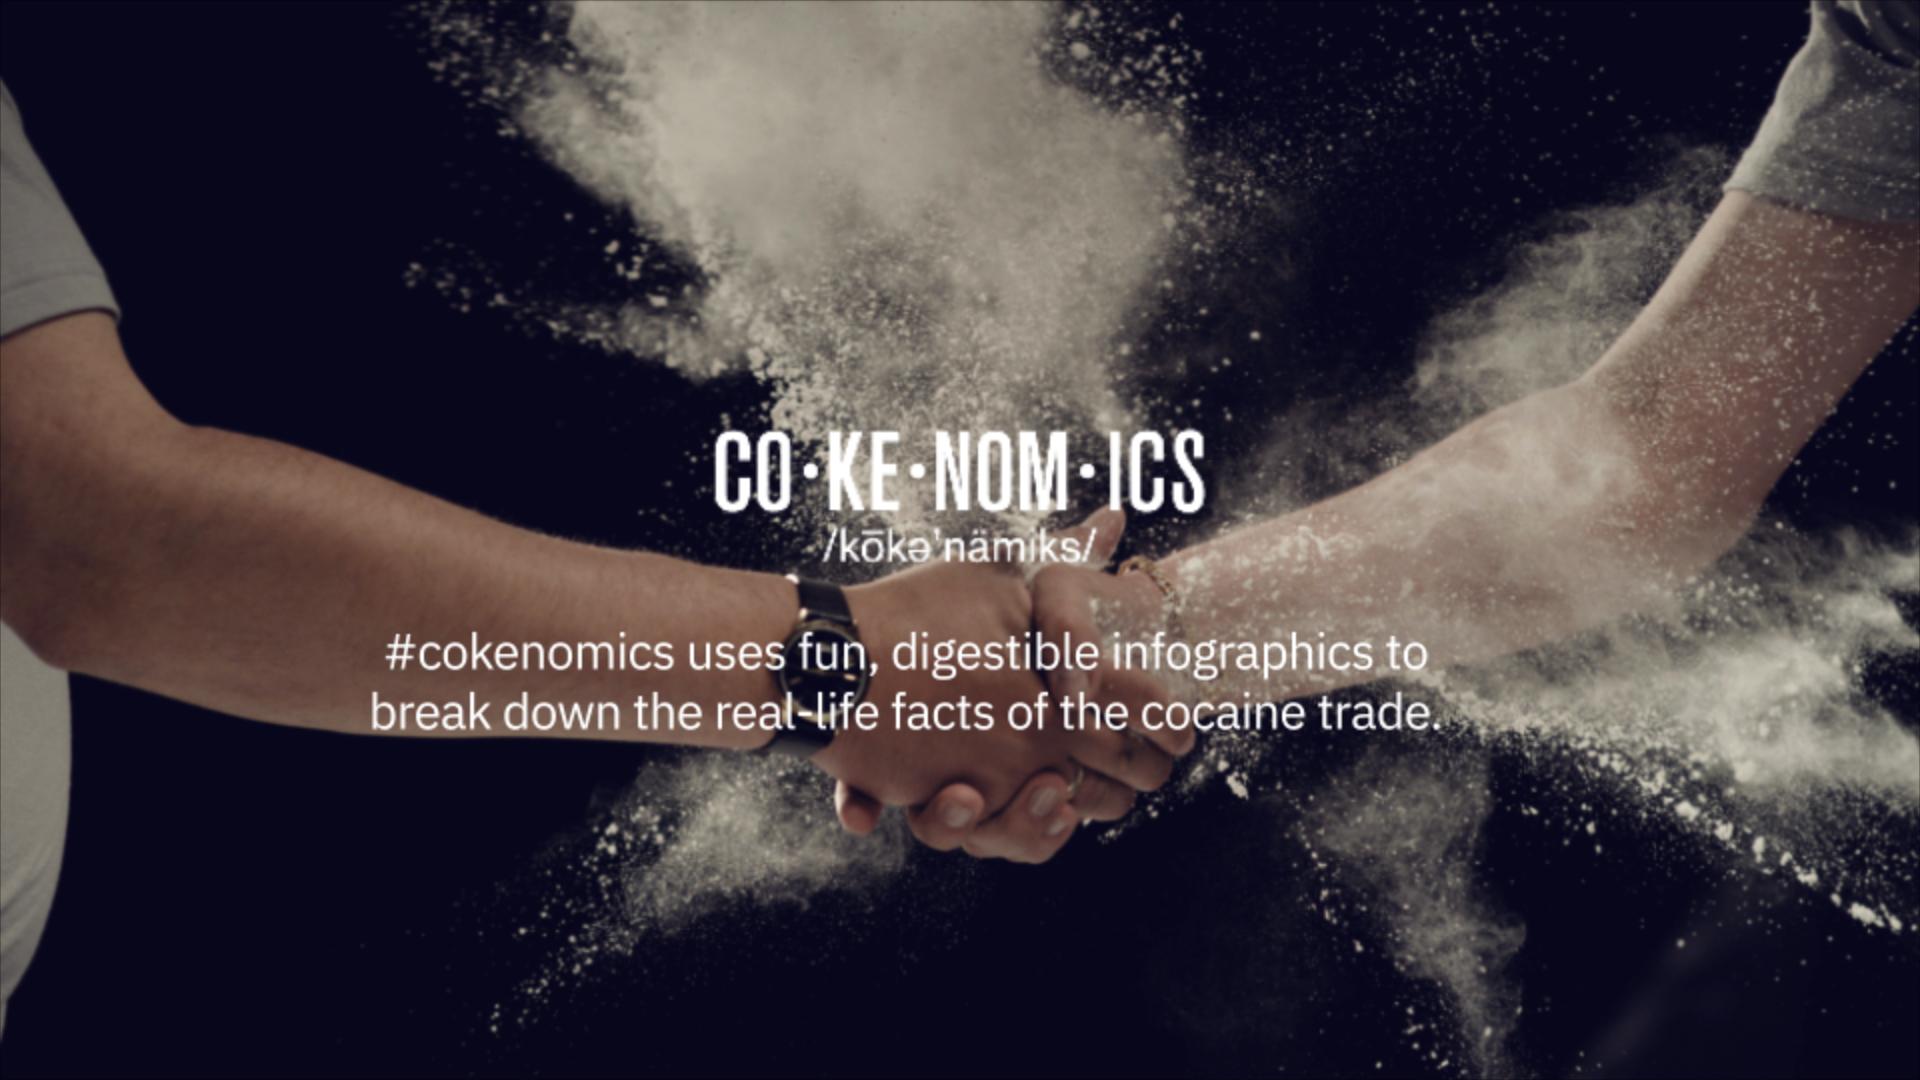 narcos cokenomics poster